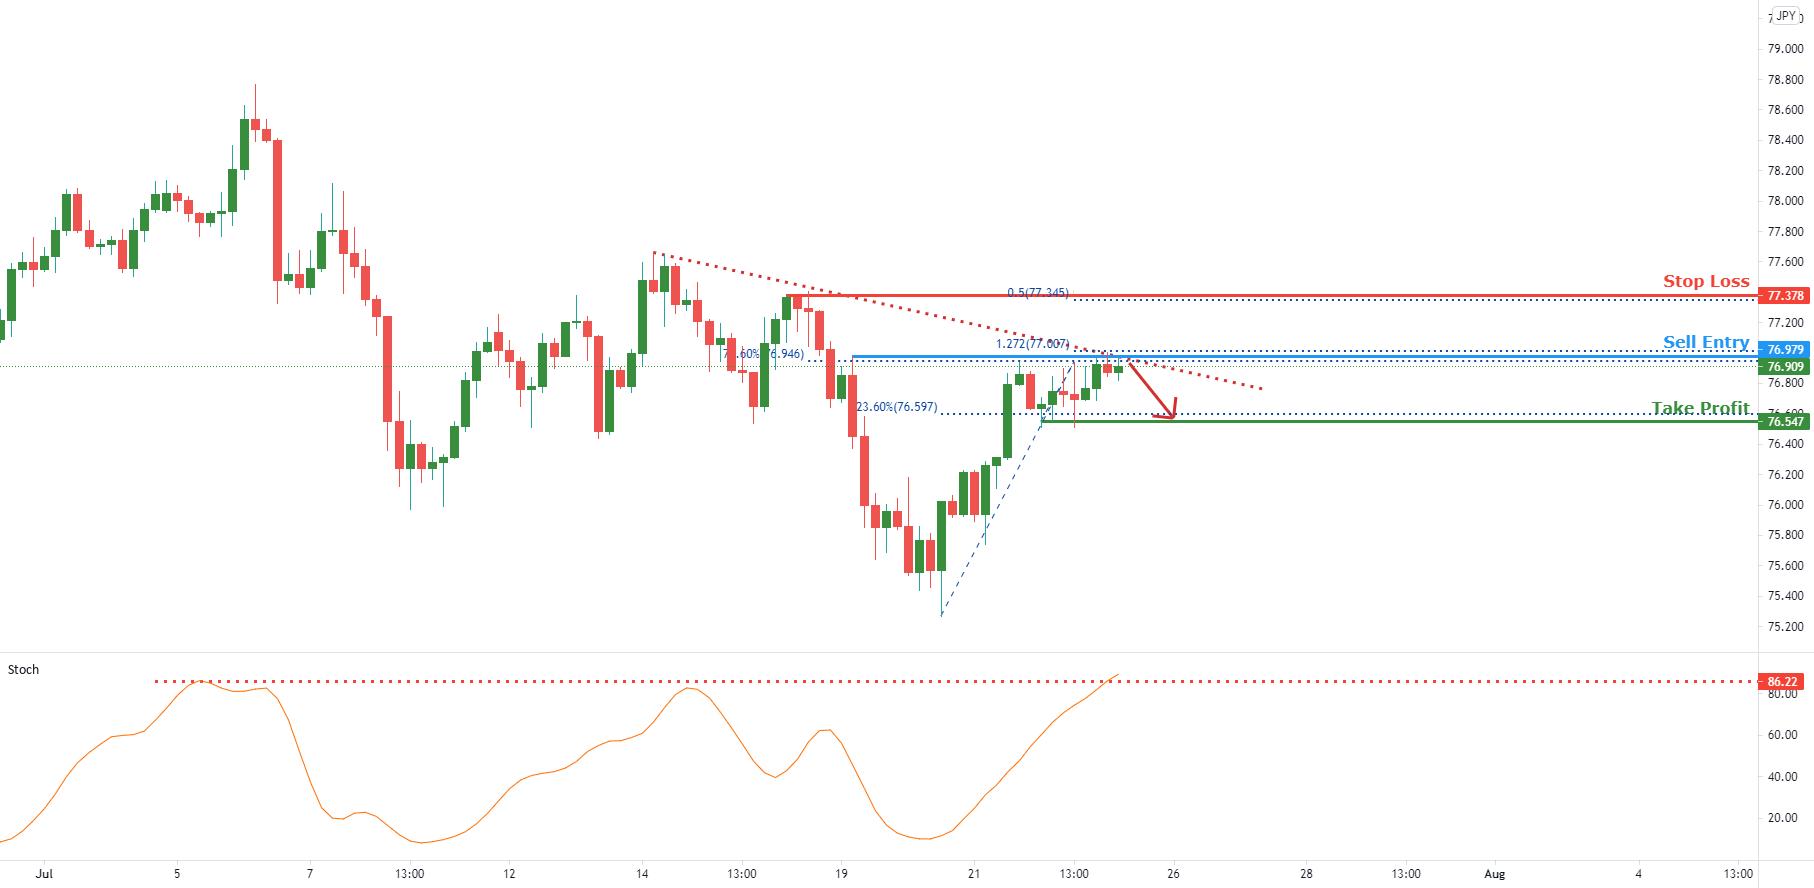 NZDJPY facing bearish pressure | 23 July 2021 for FX:NZDJPY by FXCM